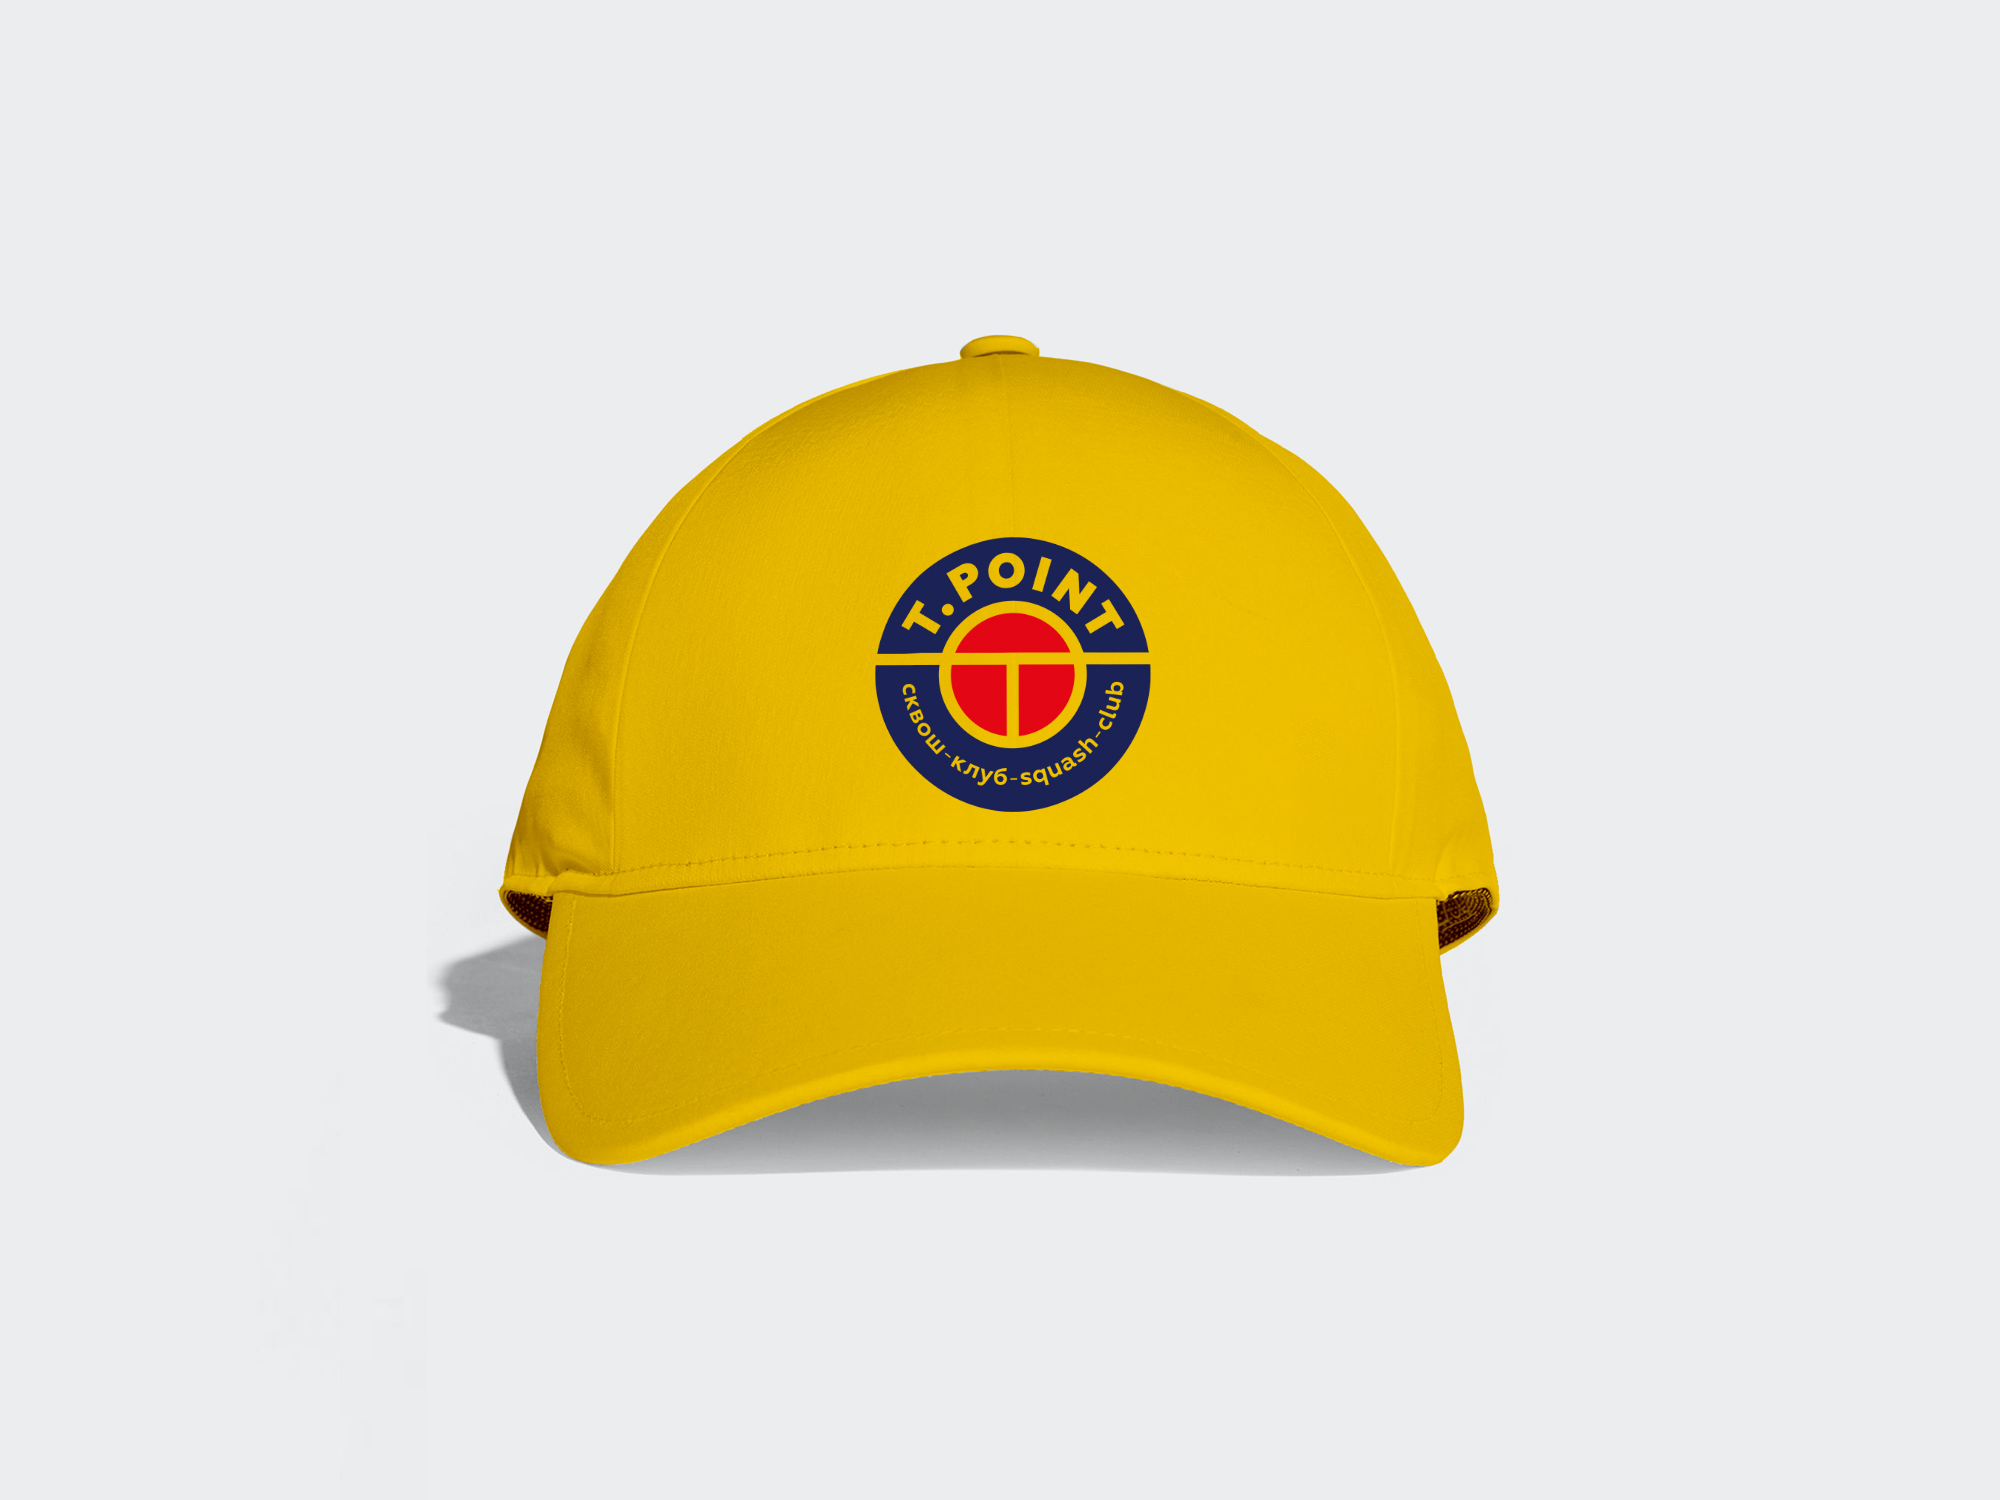 Разработка логотипа Сквош-клуба фото f_1305ce7bb8d474b4.jpg